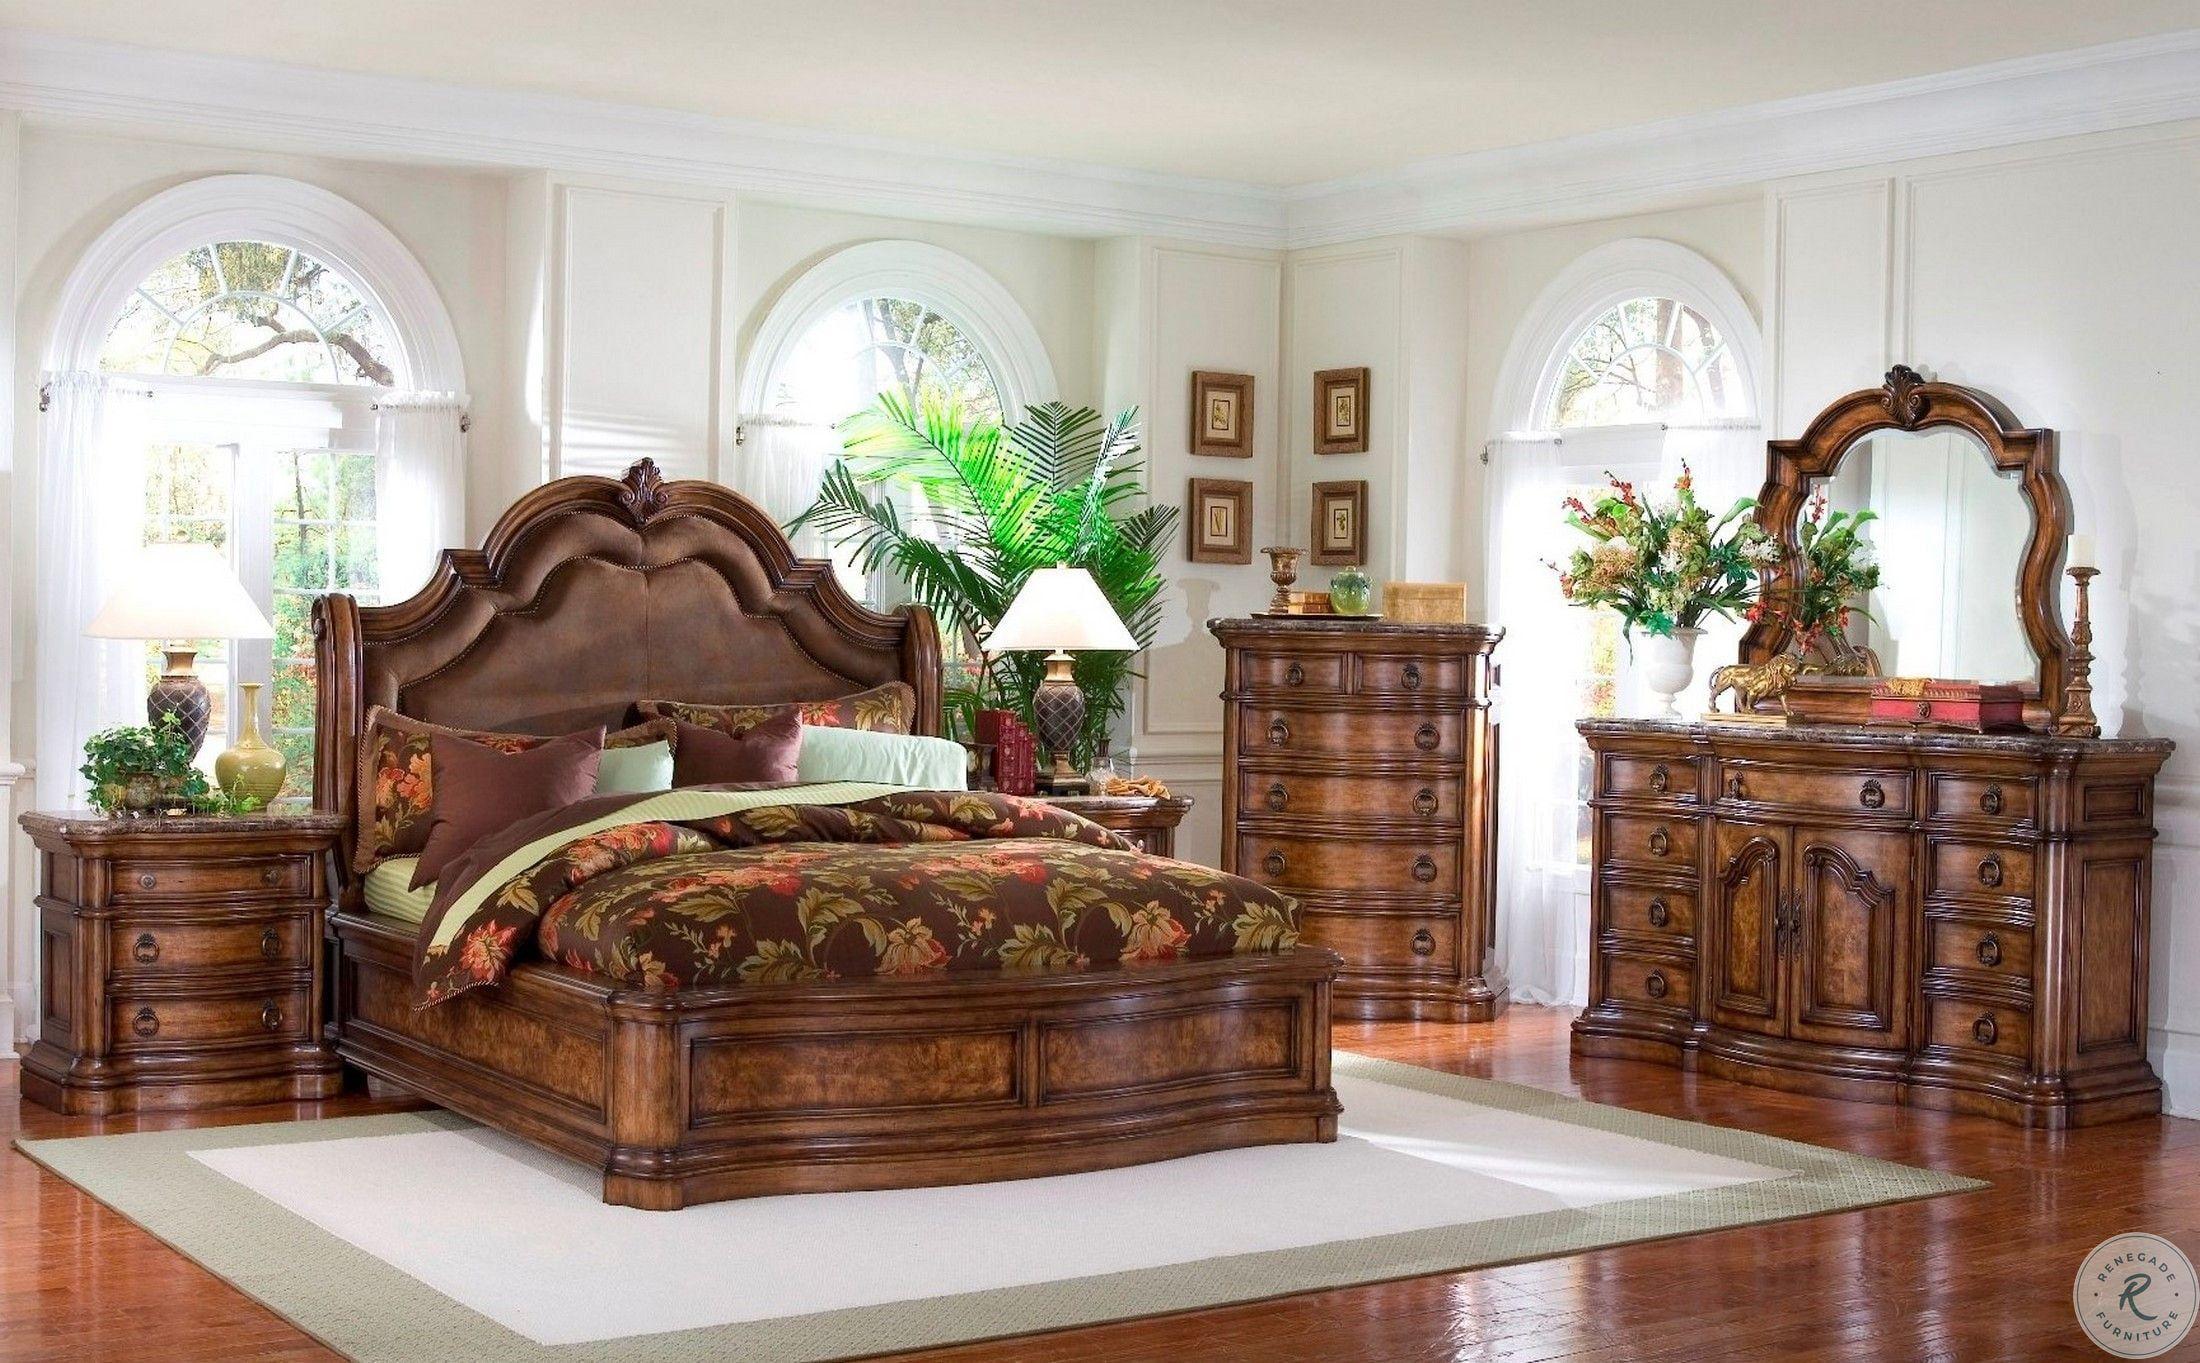 Old World Estate Bedroom Set Queen Sized Bedroom Sets Bedroom Set King Size Bedroom Sets